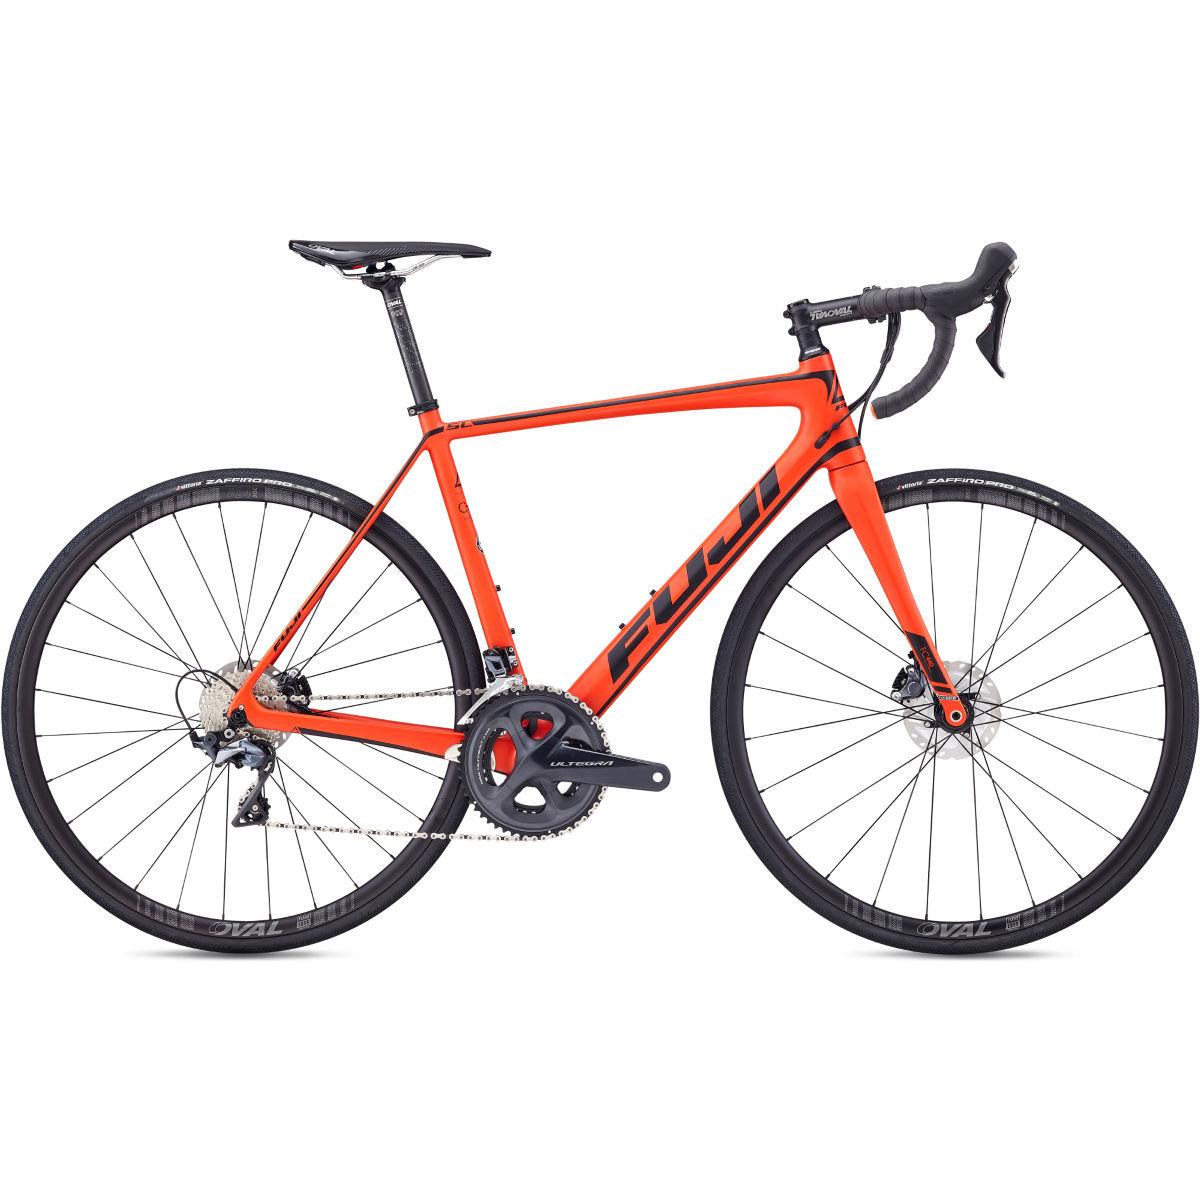 Fuji SL 2.3 Disc 2019 Bikes